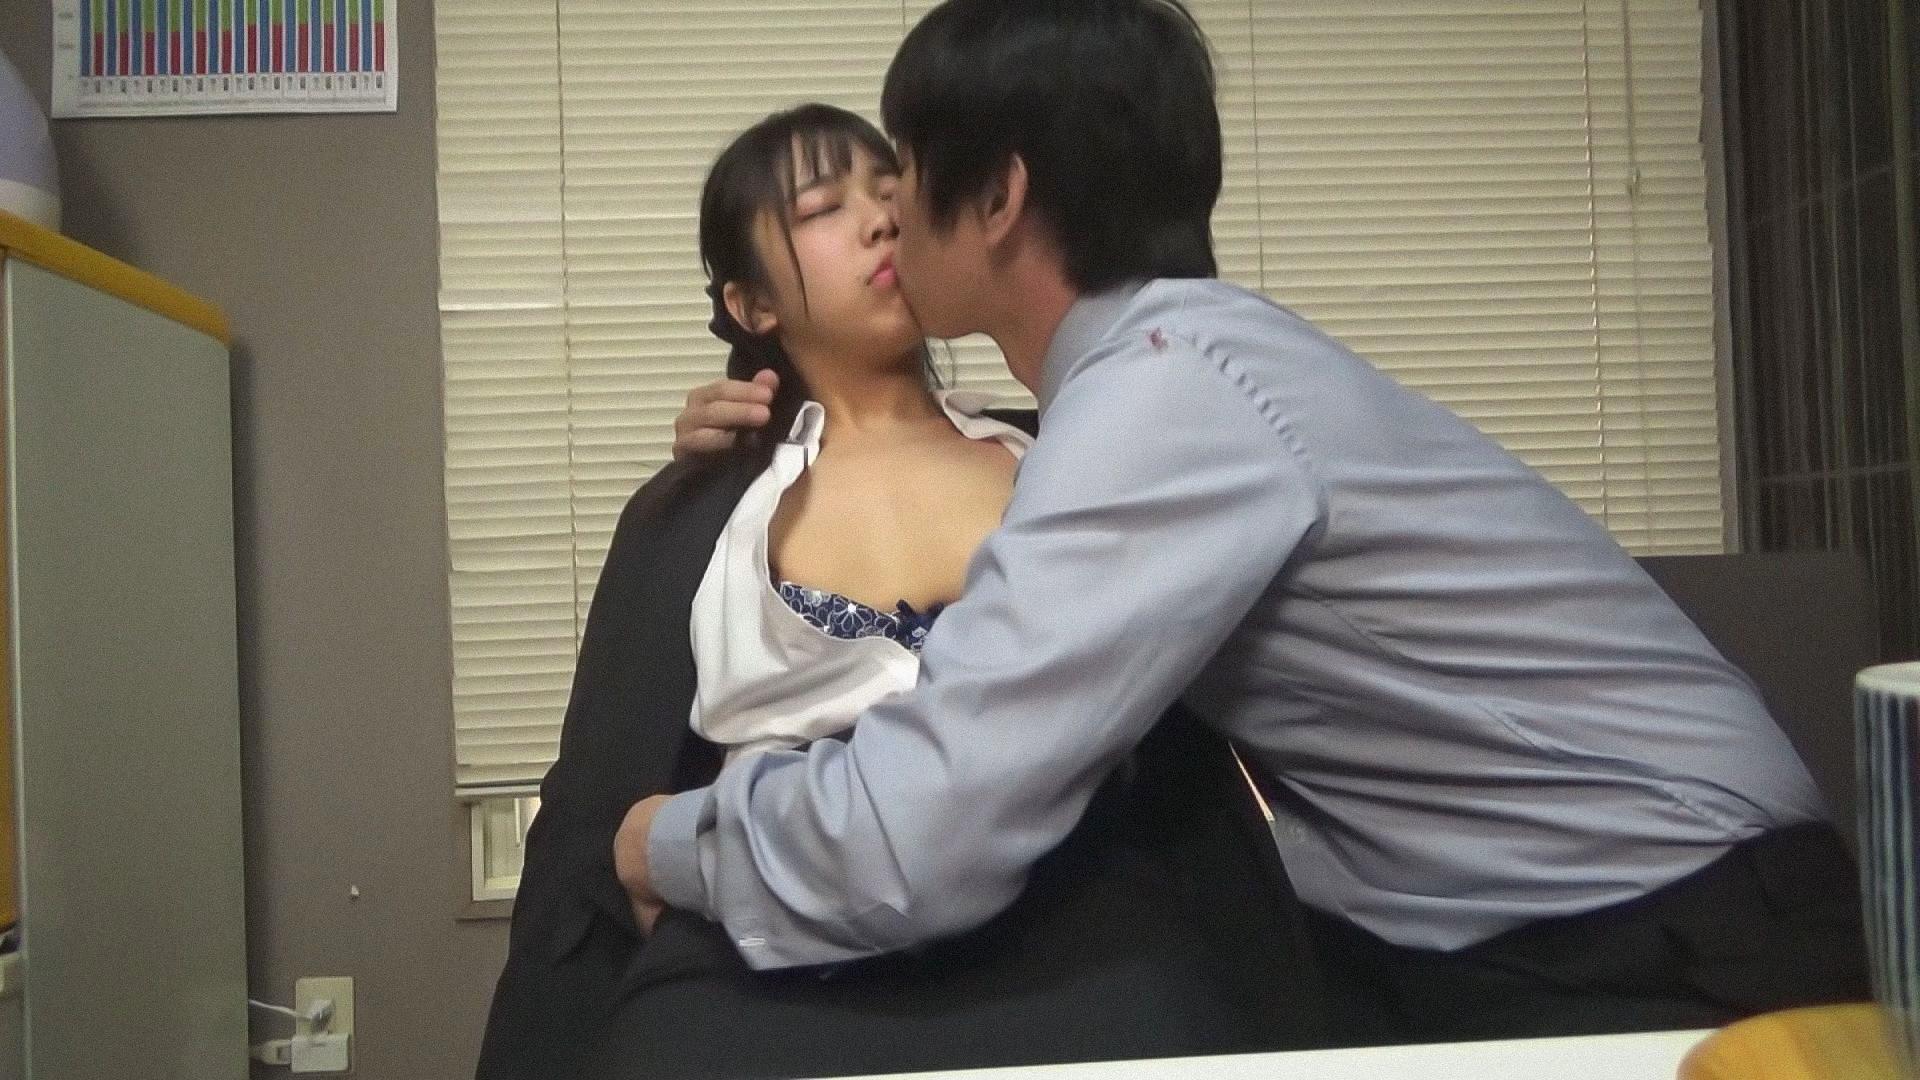 【CASE#1】就活面接に来た女子大生に睡〇薬入りのお茶を出した結果...!? 画像6